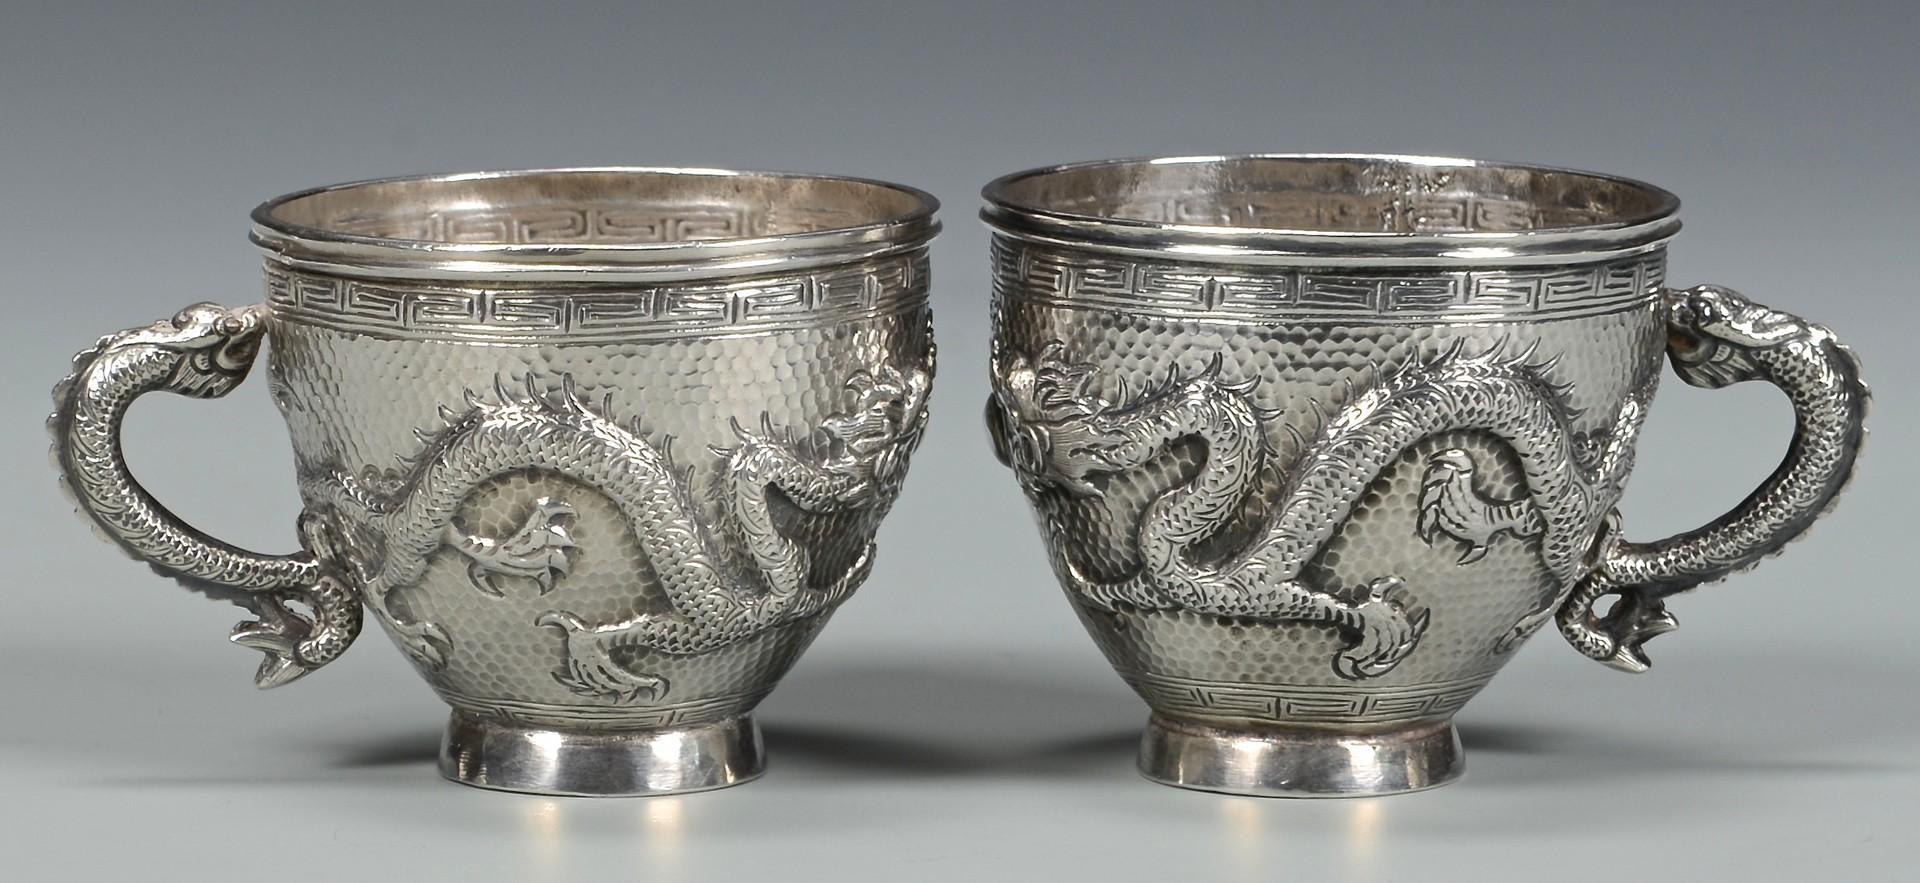 Lot 38: Chinese Export Silver Tea Set, 10 pcs